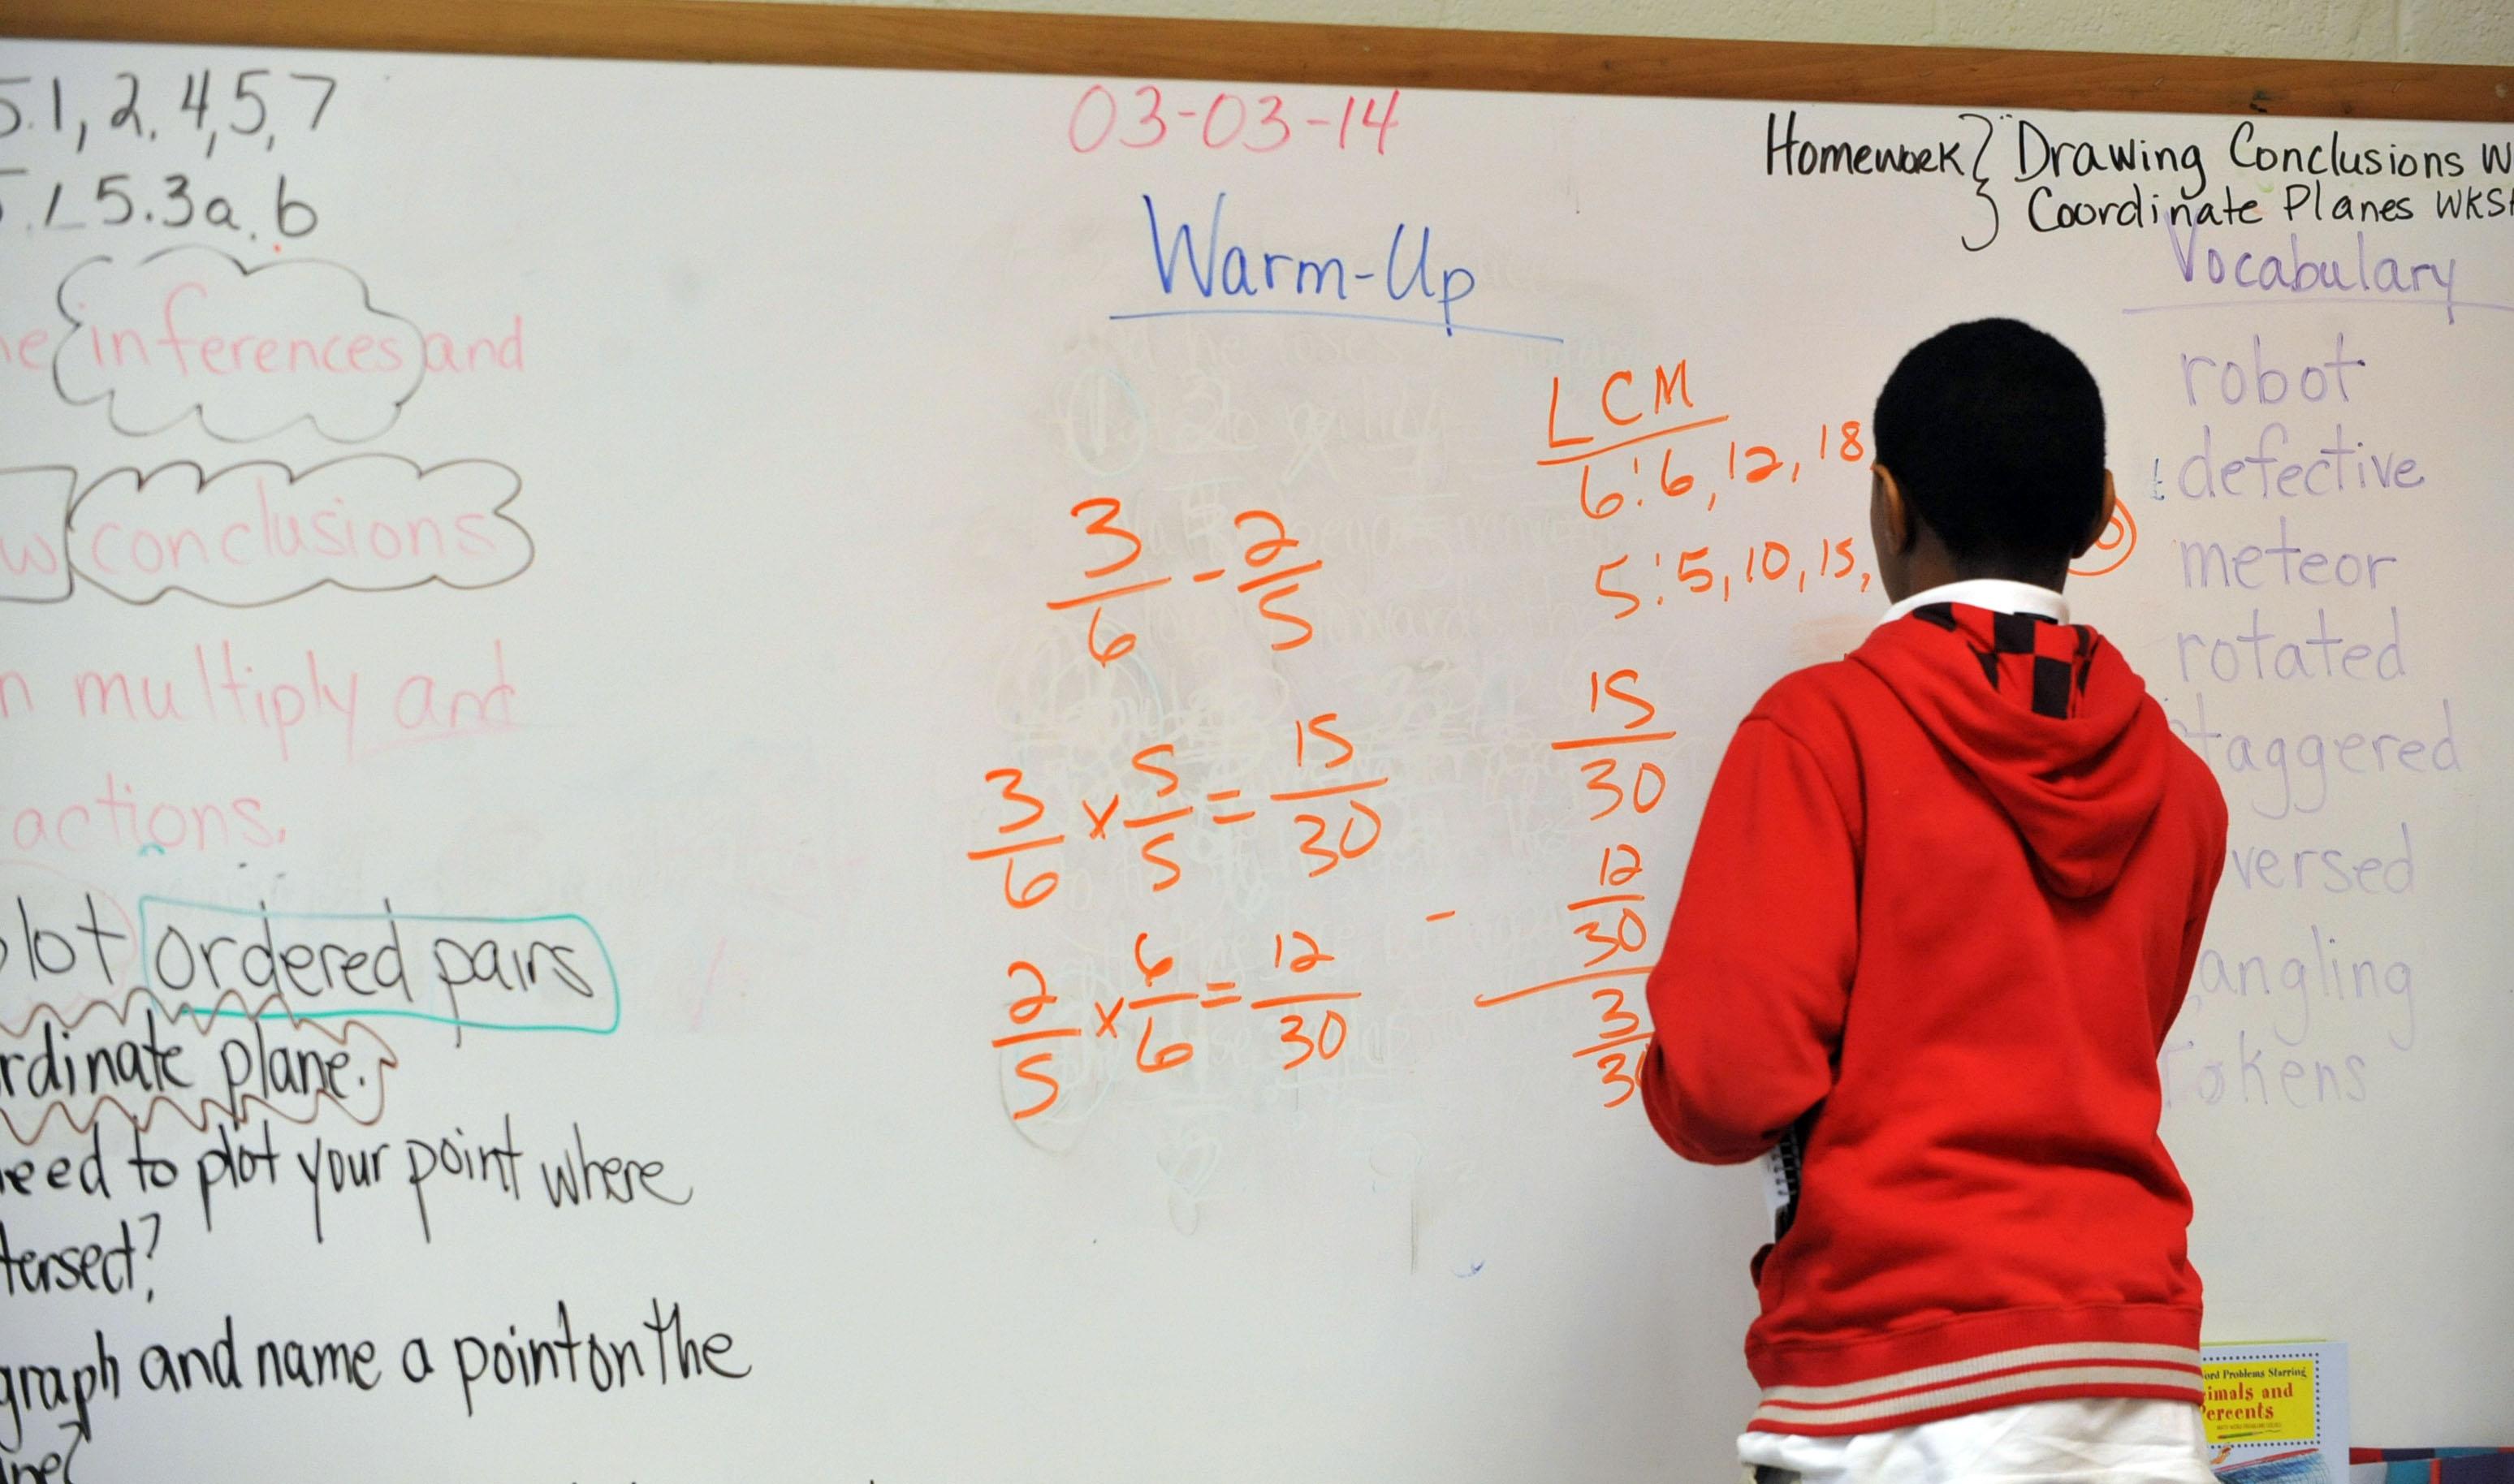 Fifth-grade student Tracey Bridges works a problem on the board at Venetian Hills Elementary School Monday, March 3, 2014. KENT D. JOHNSON / KDJOHNSON@AJC.COM